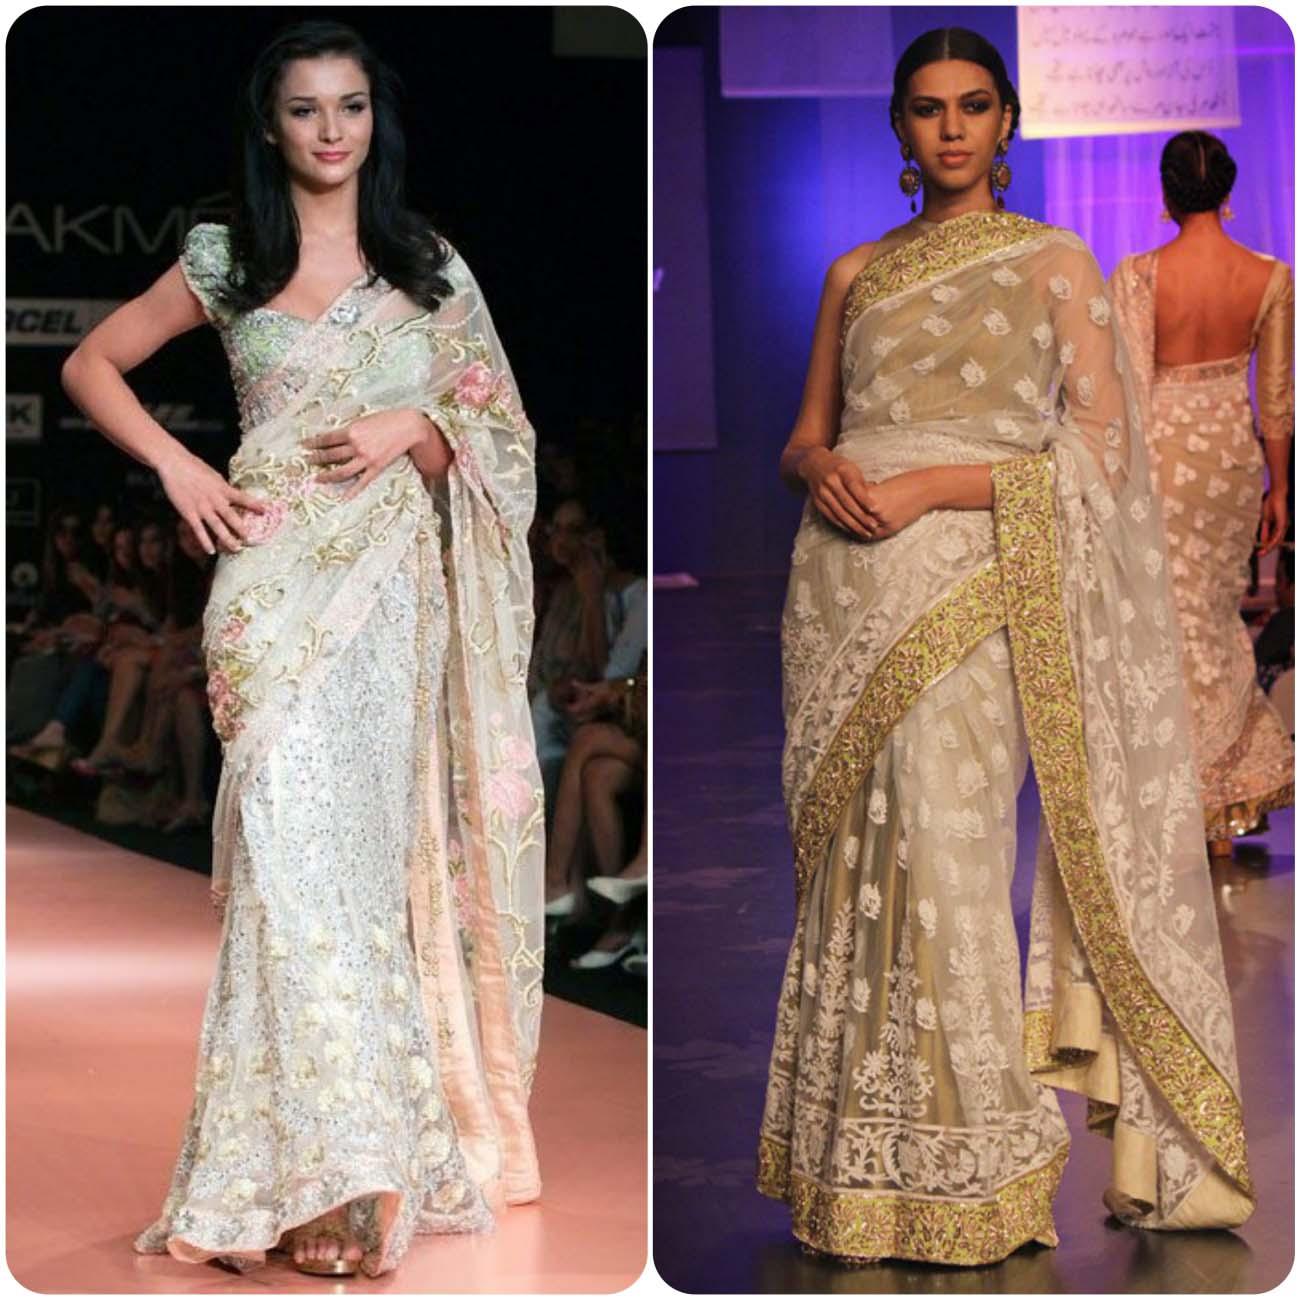 Manish Malhotra Designers Saree Collection 2016-2017